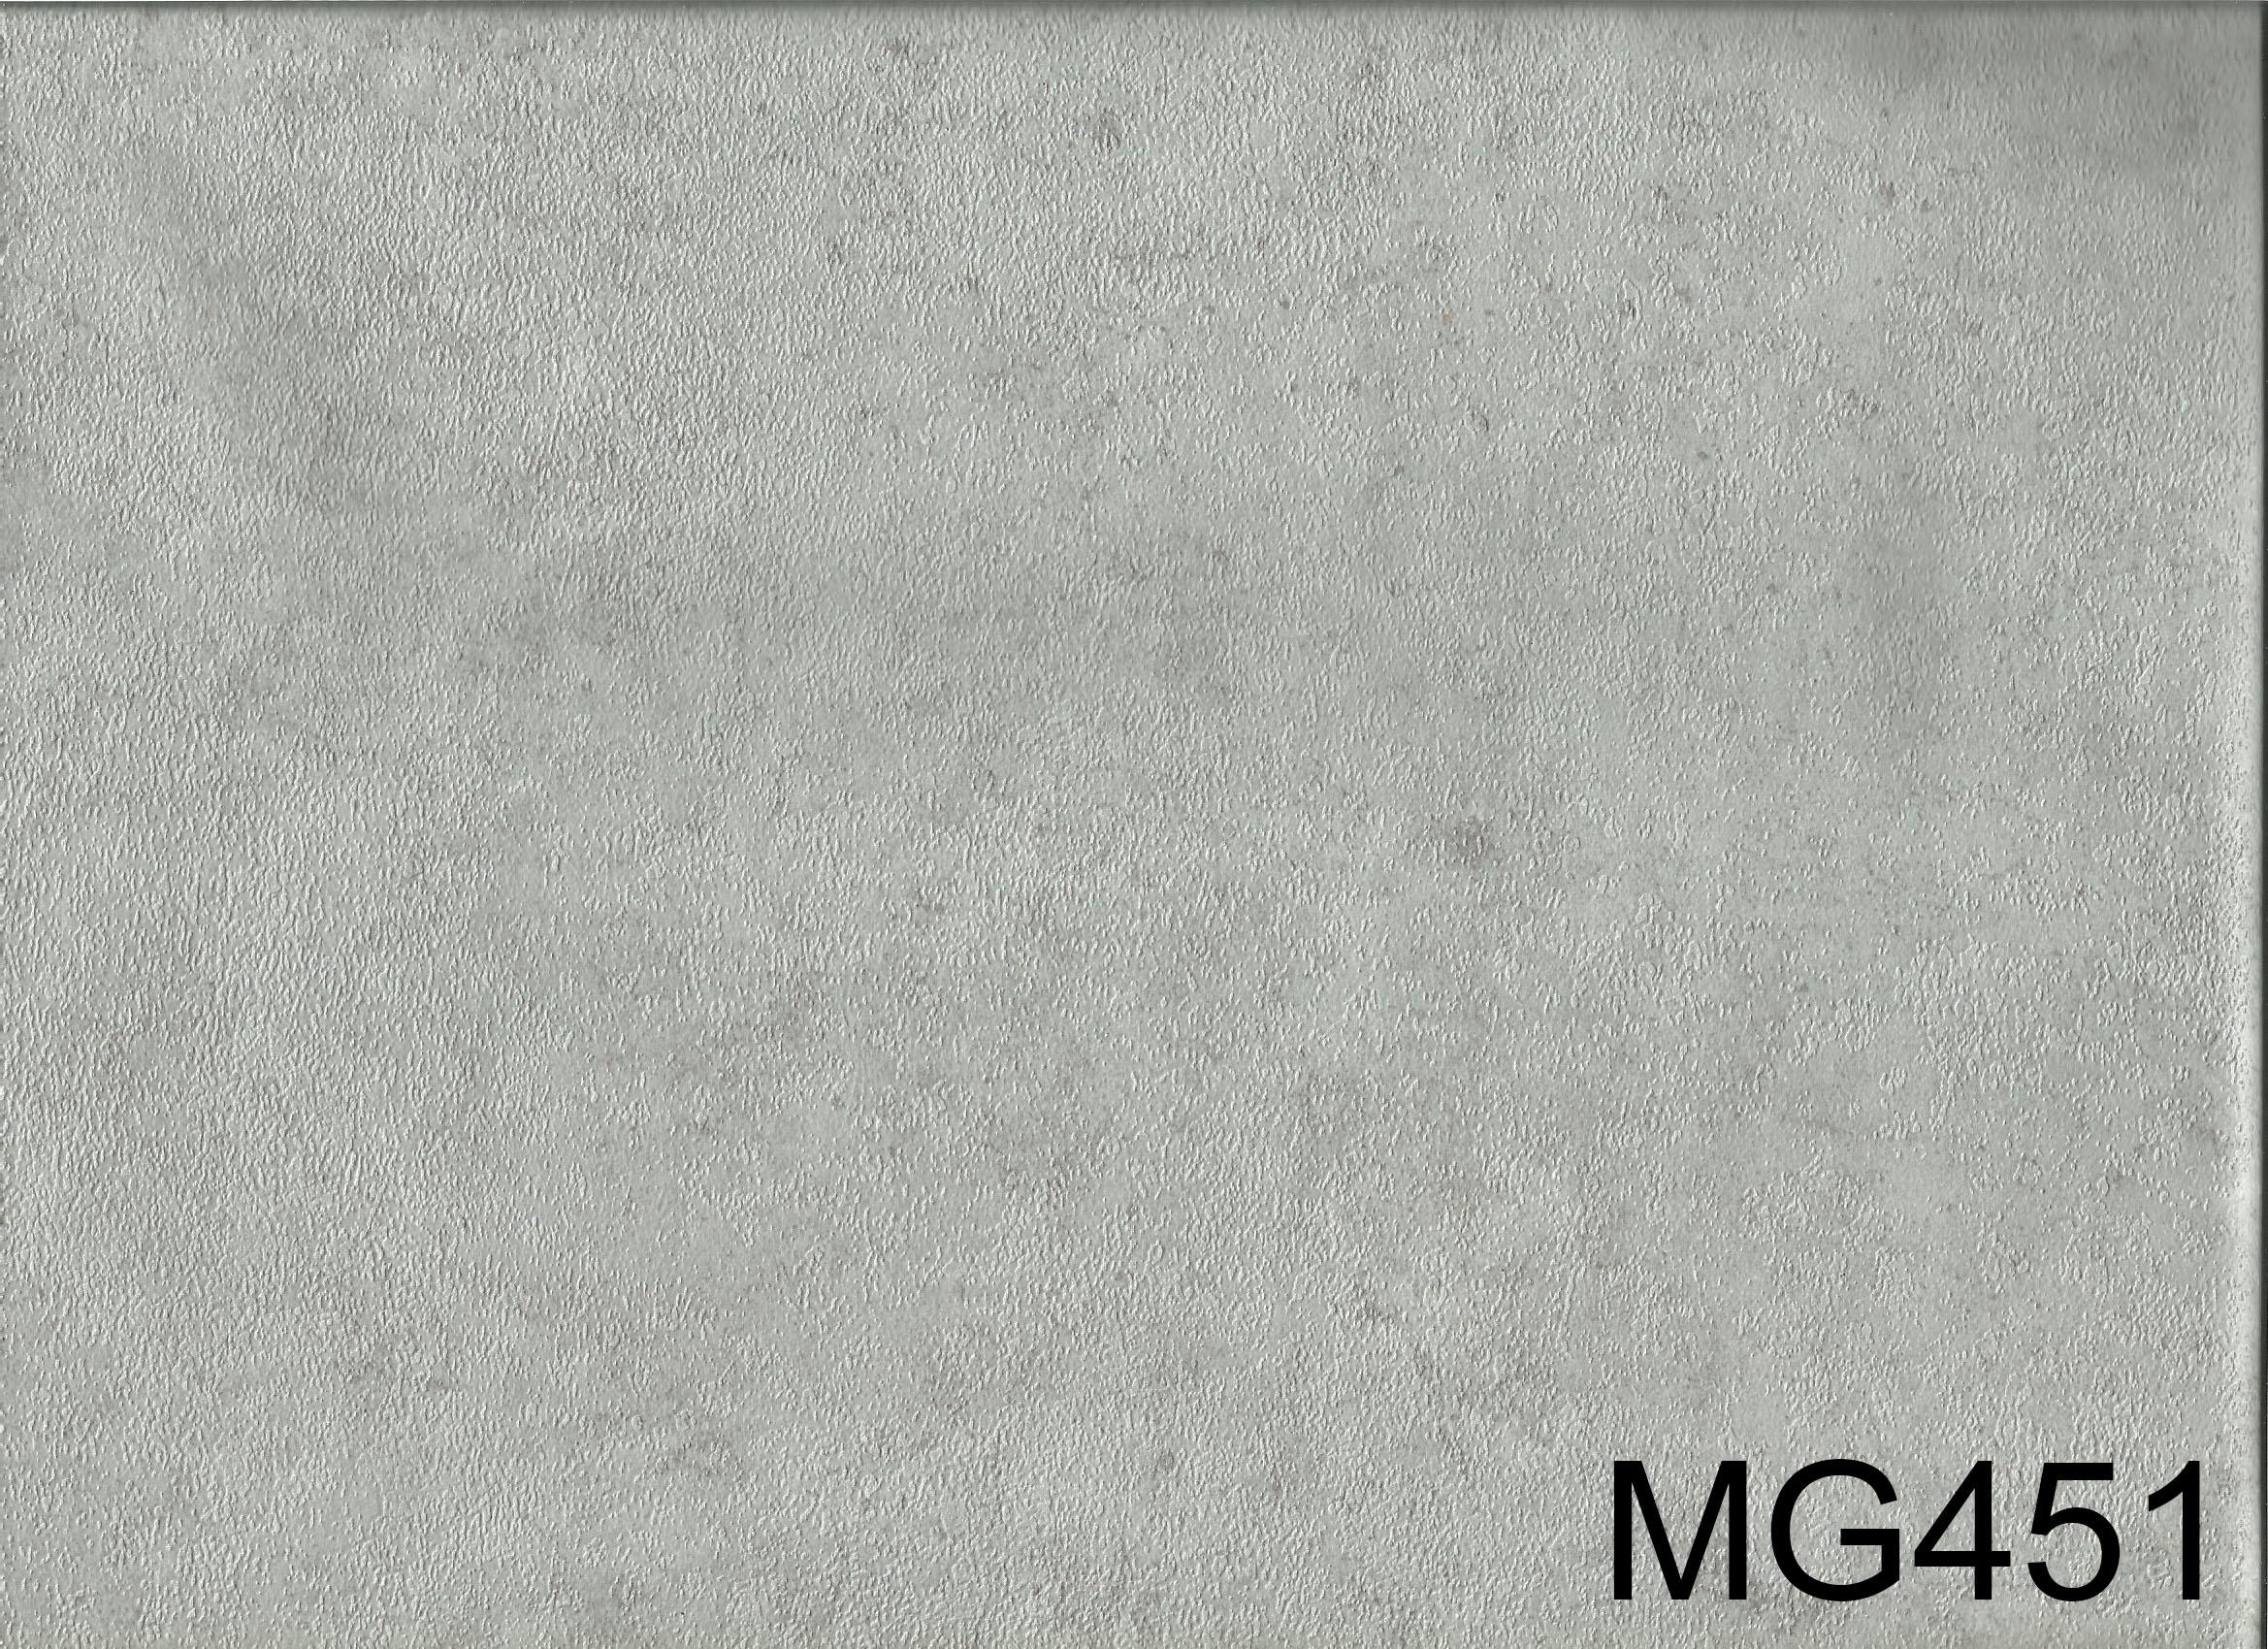 MG451